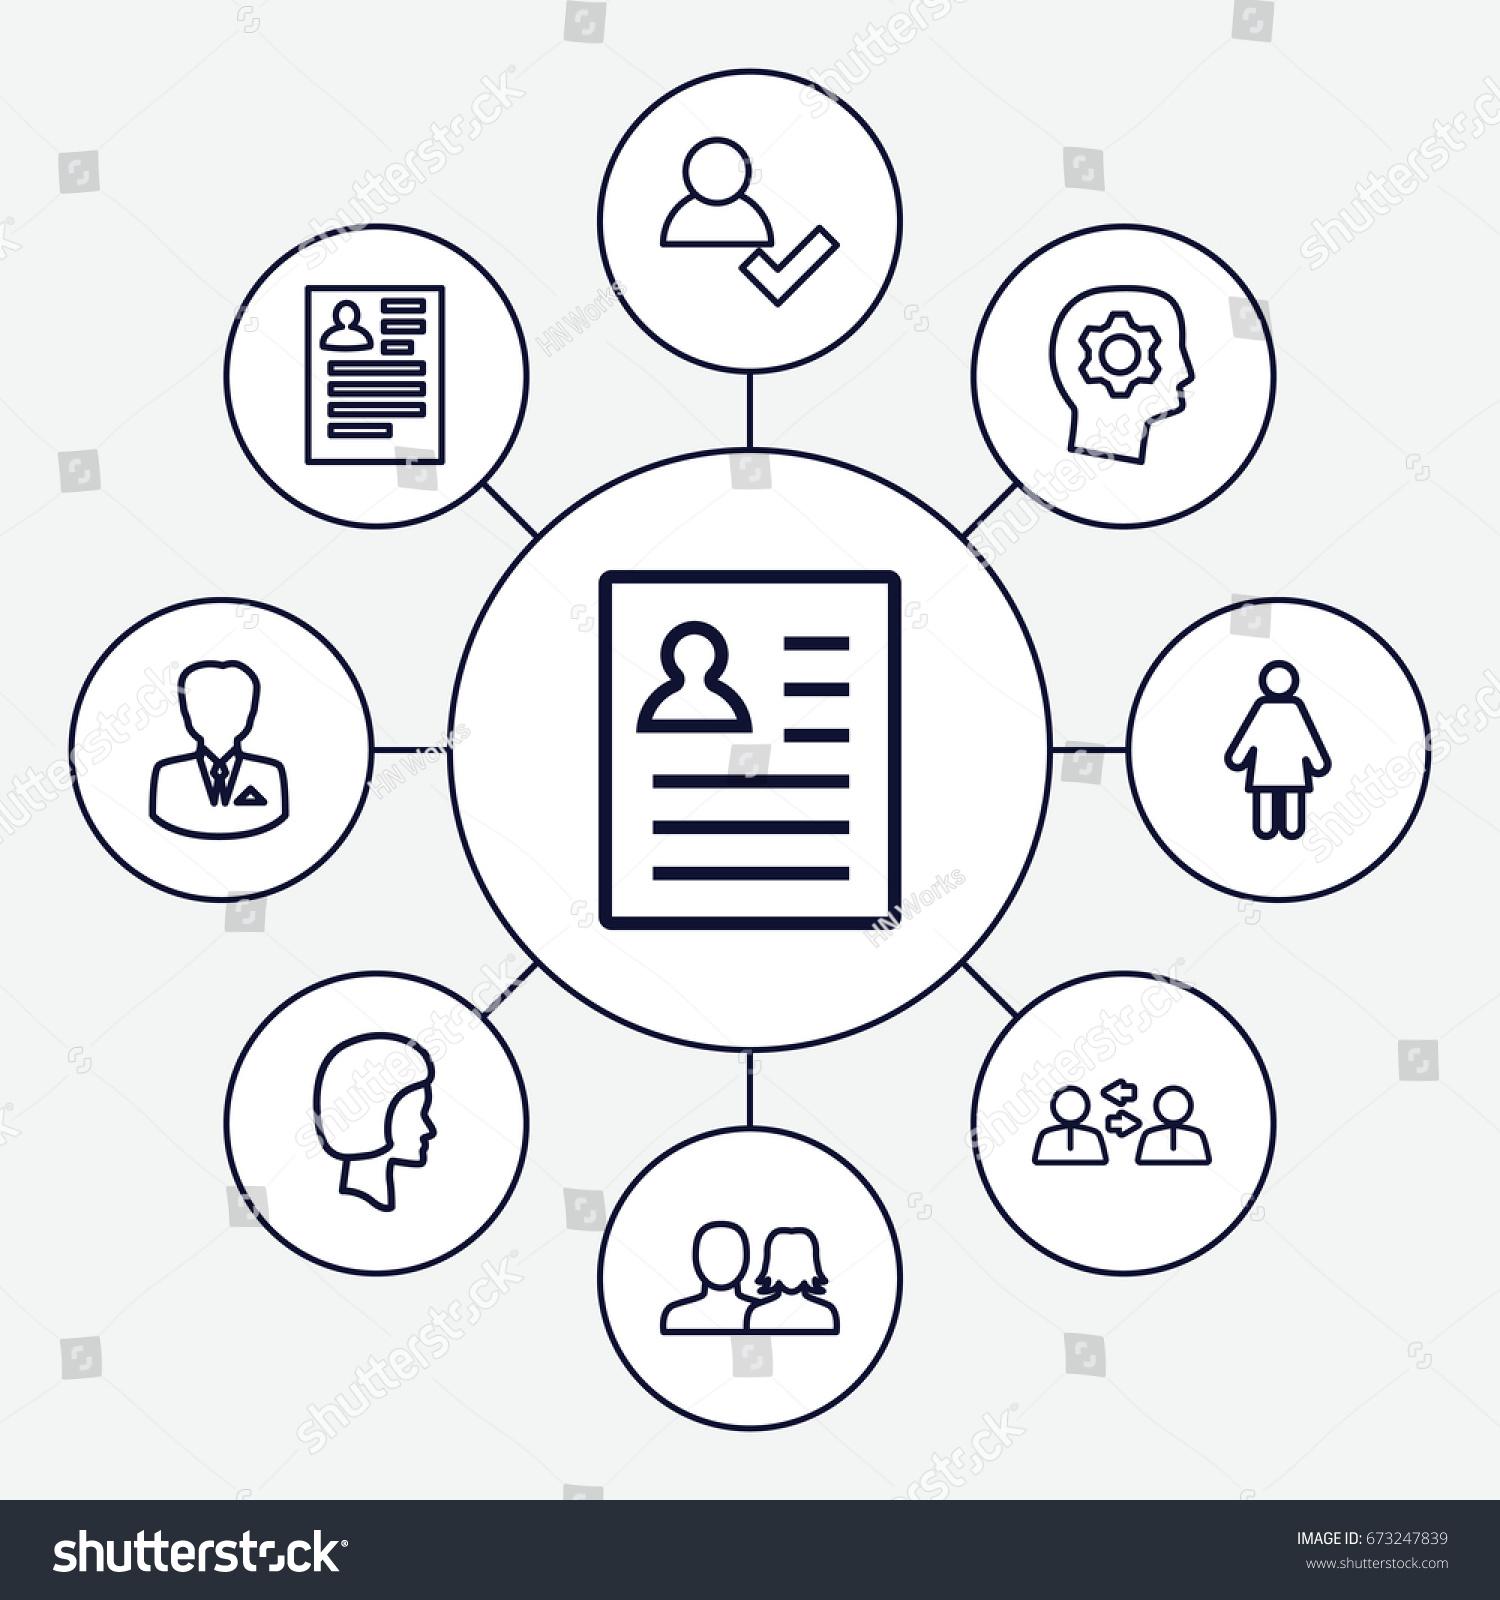 profile icons set set 9 profile stock vector 673247839 shutterstock